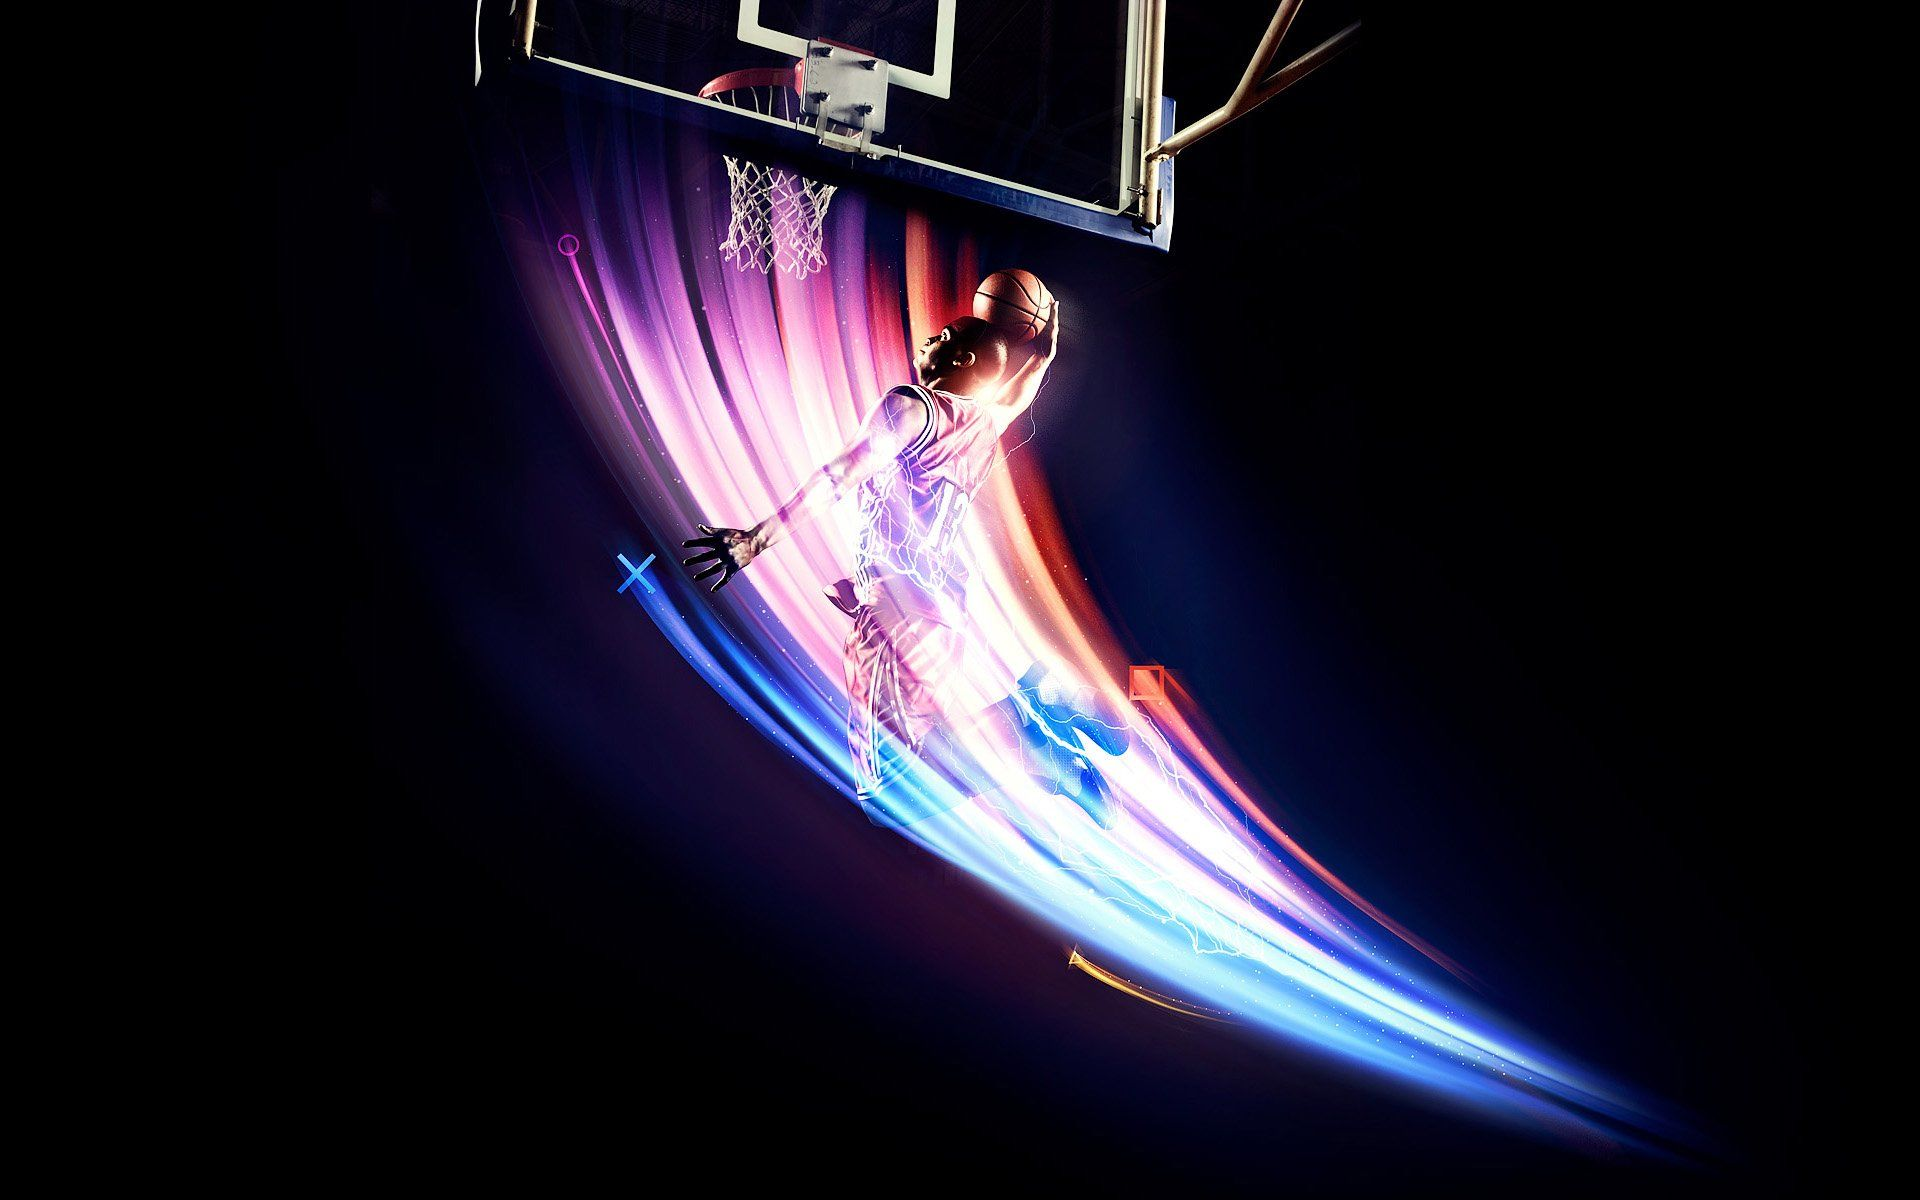 Cool basketball wallpapers hd WallpaperLost Обои для